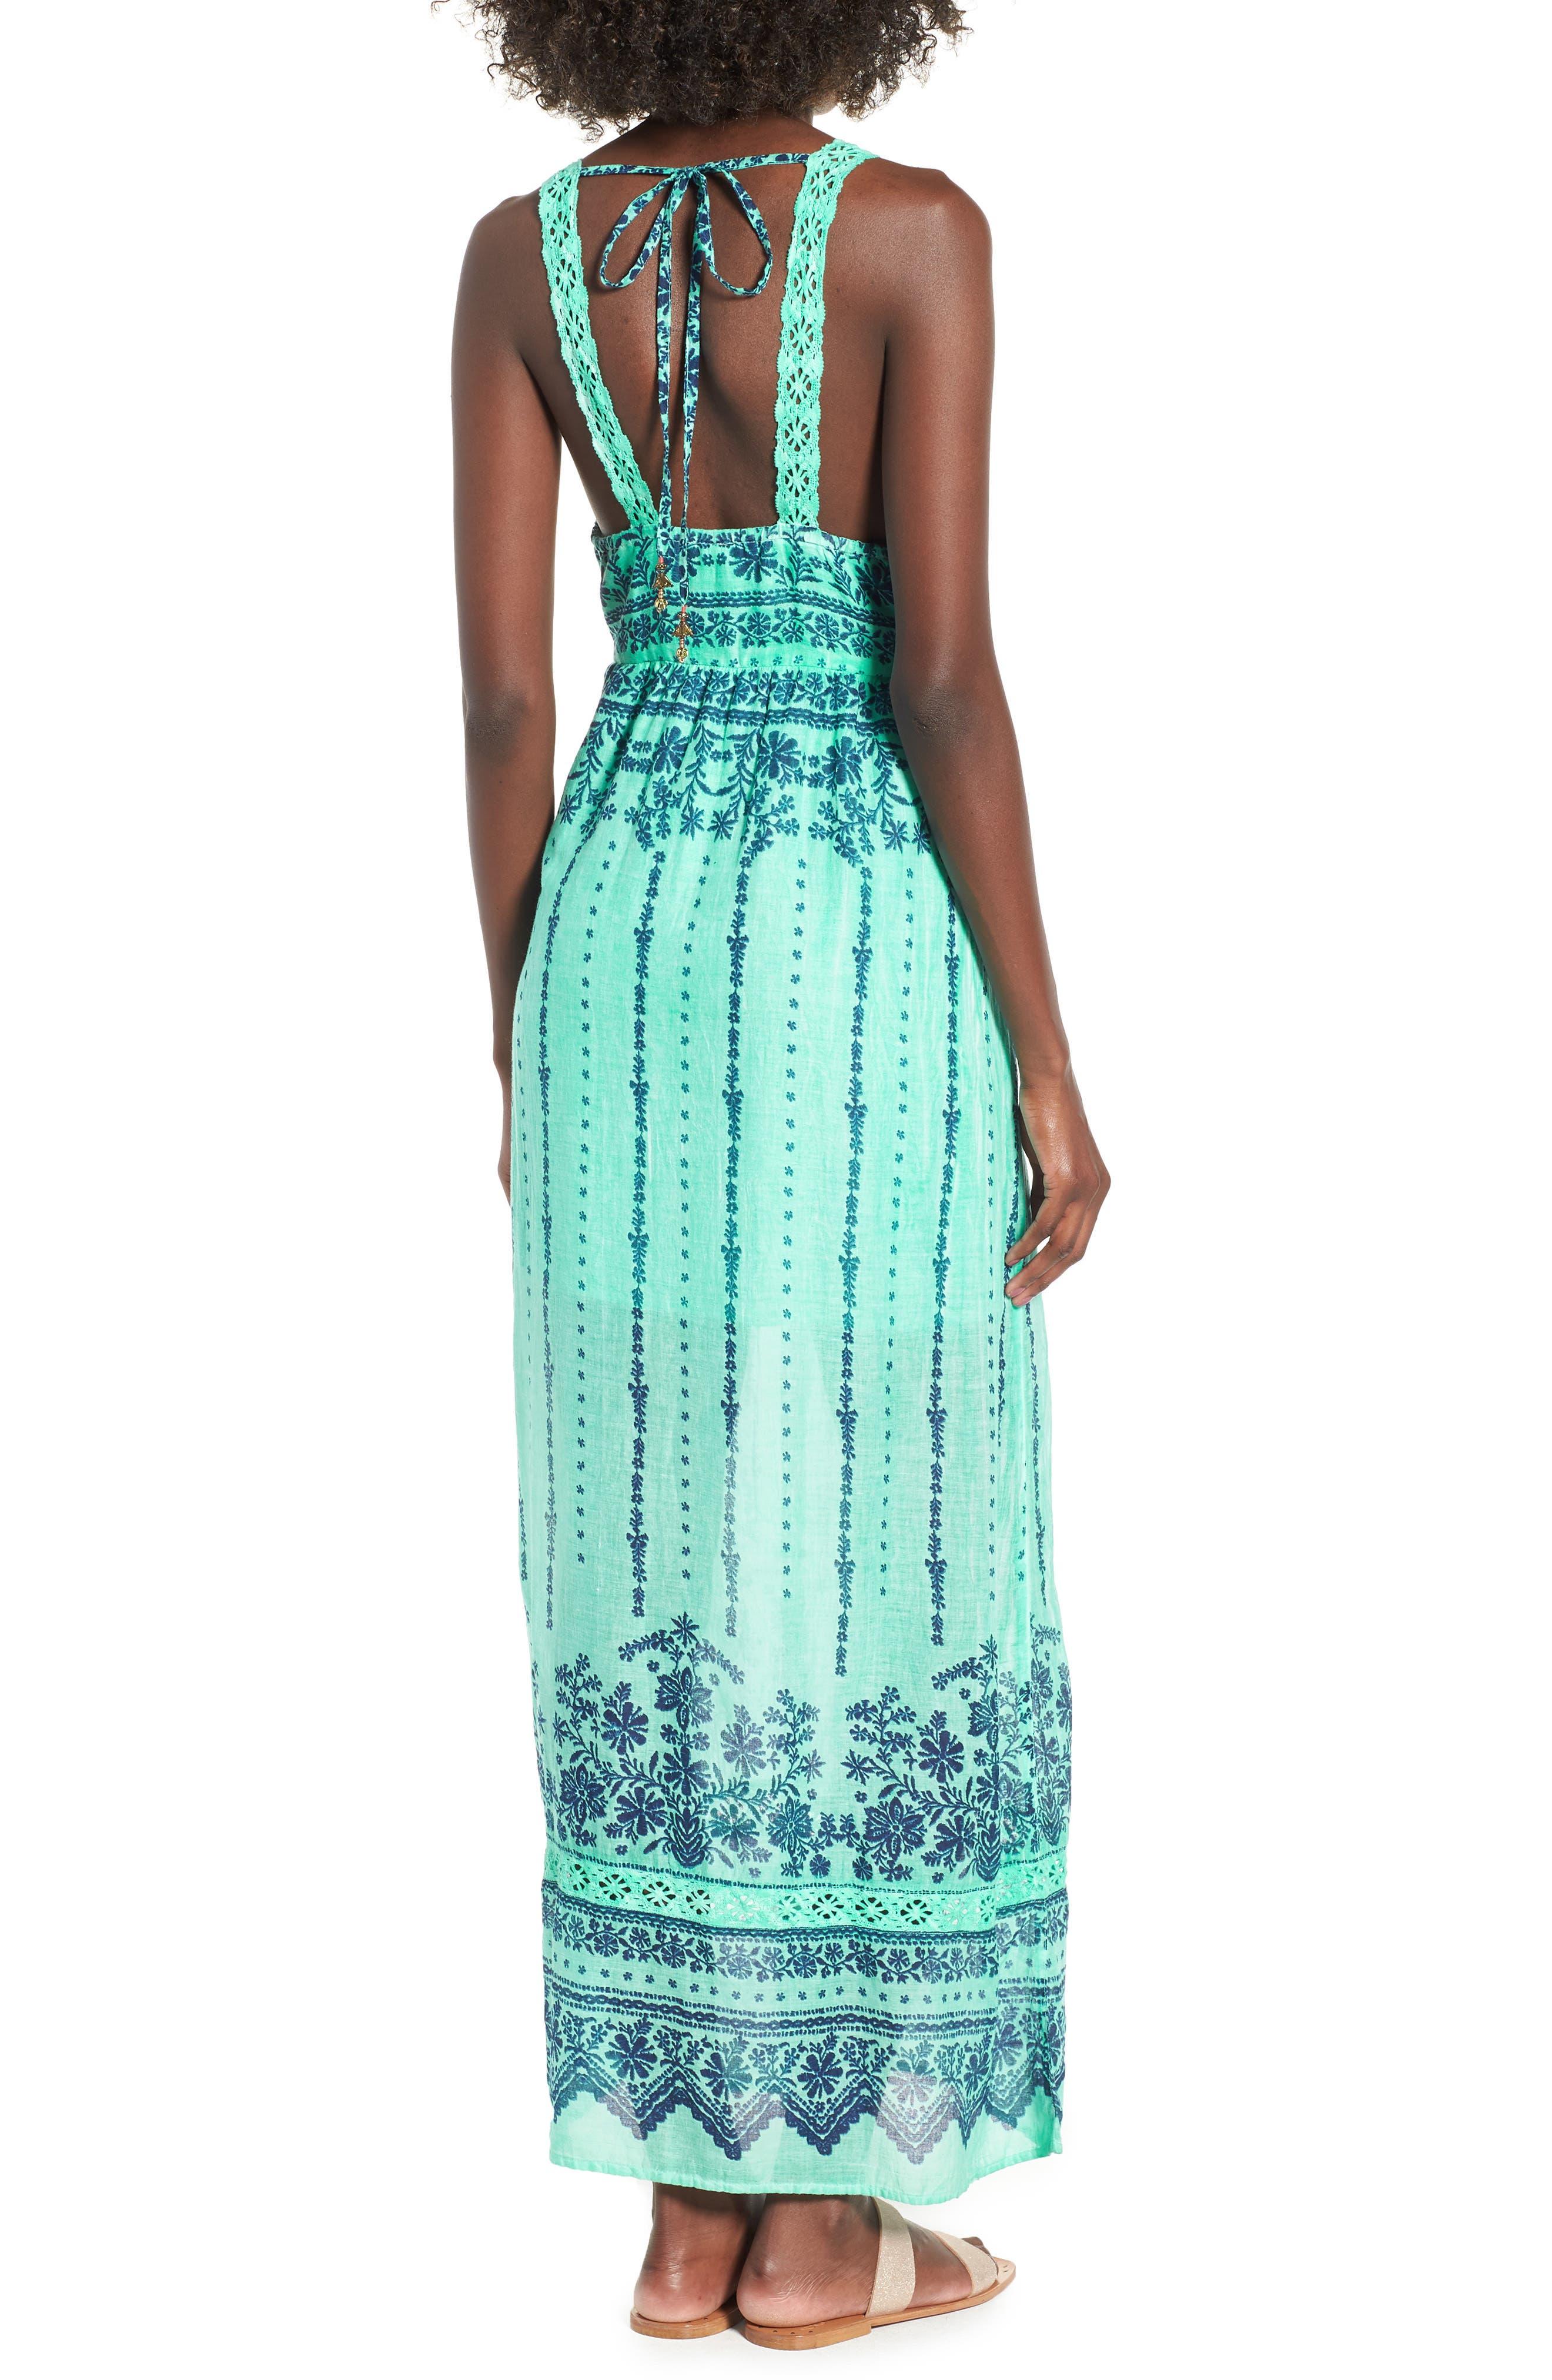 La Playita Maxi Dress,                             Alternate thumbnail 2, color,                             300